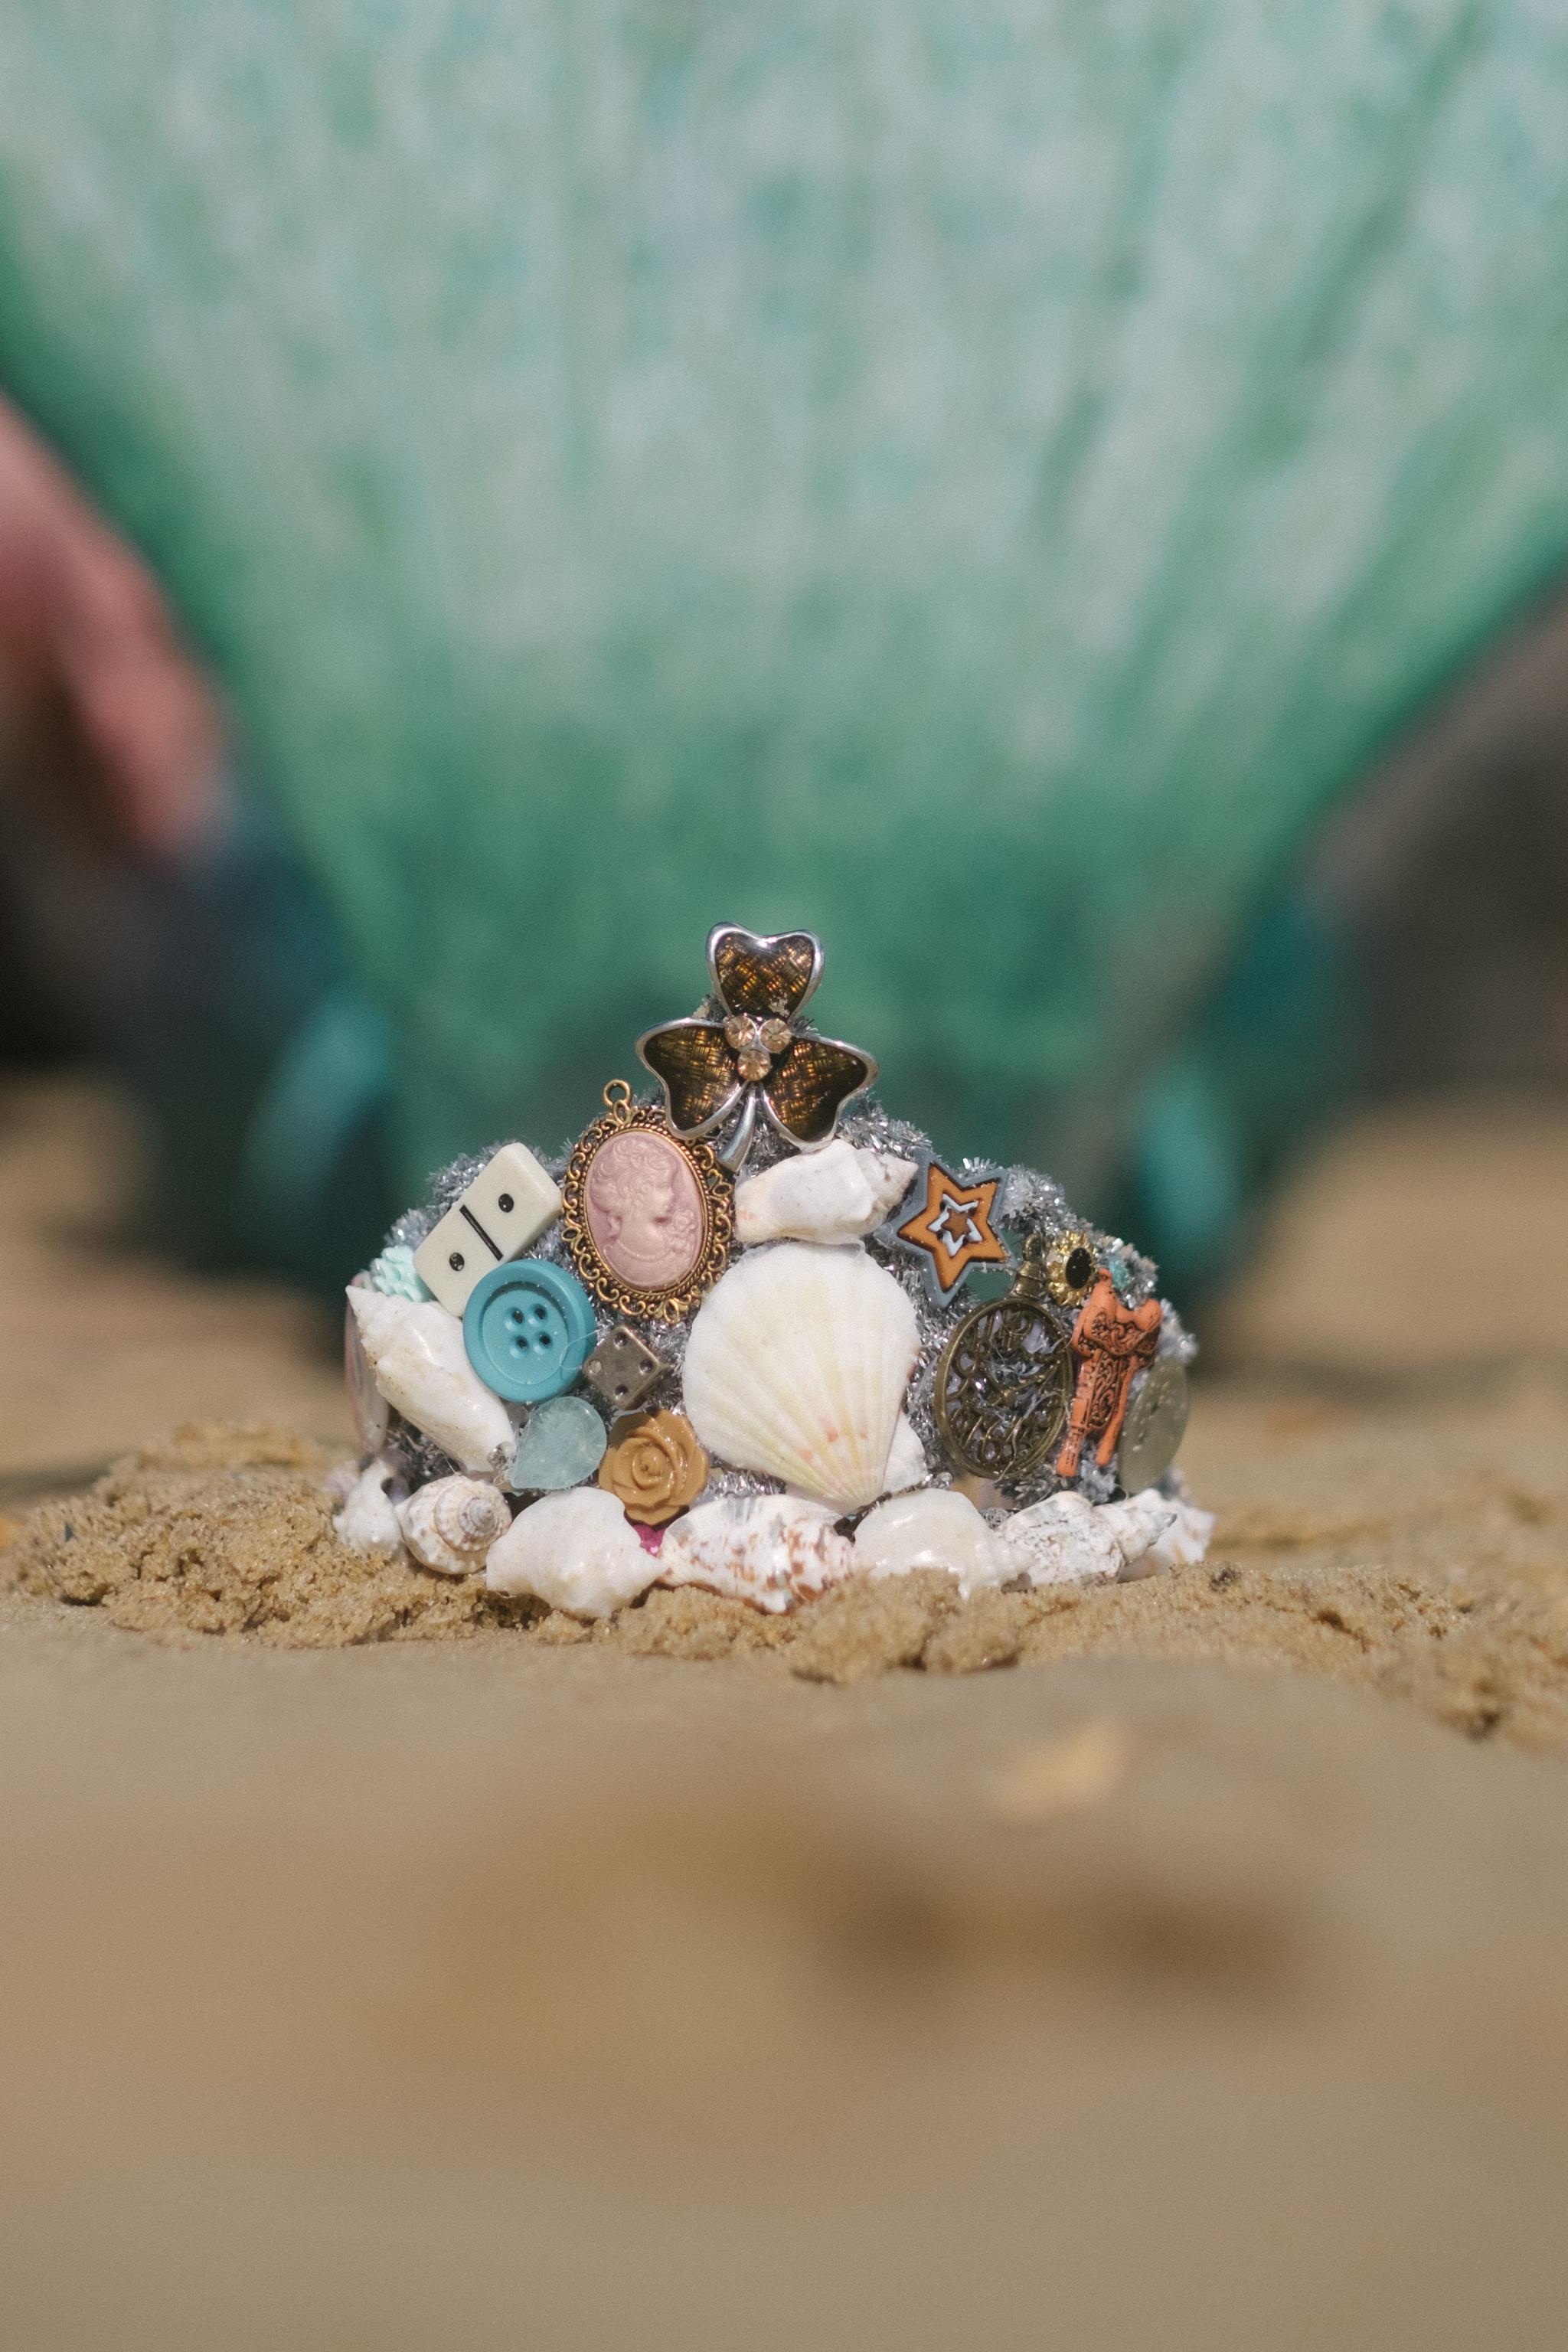 Body-Positive-Mermaids-Grace-Elizabeth-Mermaiding-UK-Alternative-Wedding-Photographer-Colchester-Essex-Suffolk-Norfolk-Devon (15 of 59).jpg